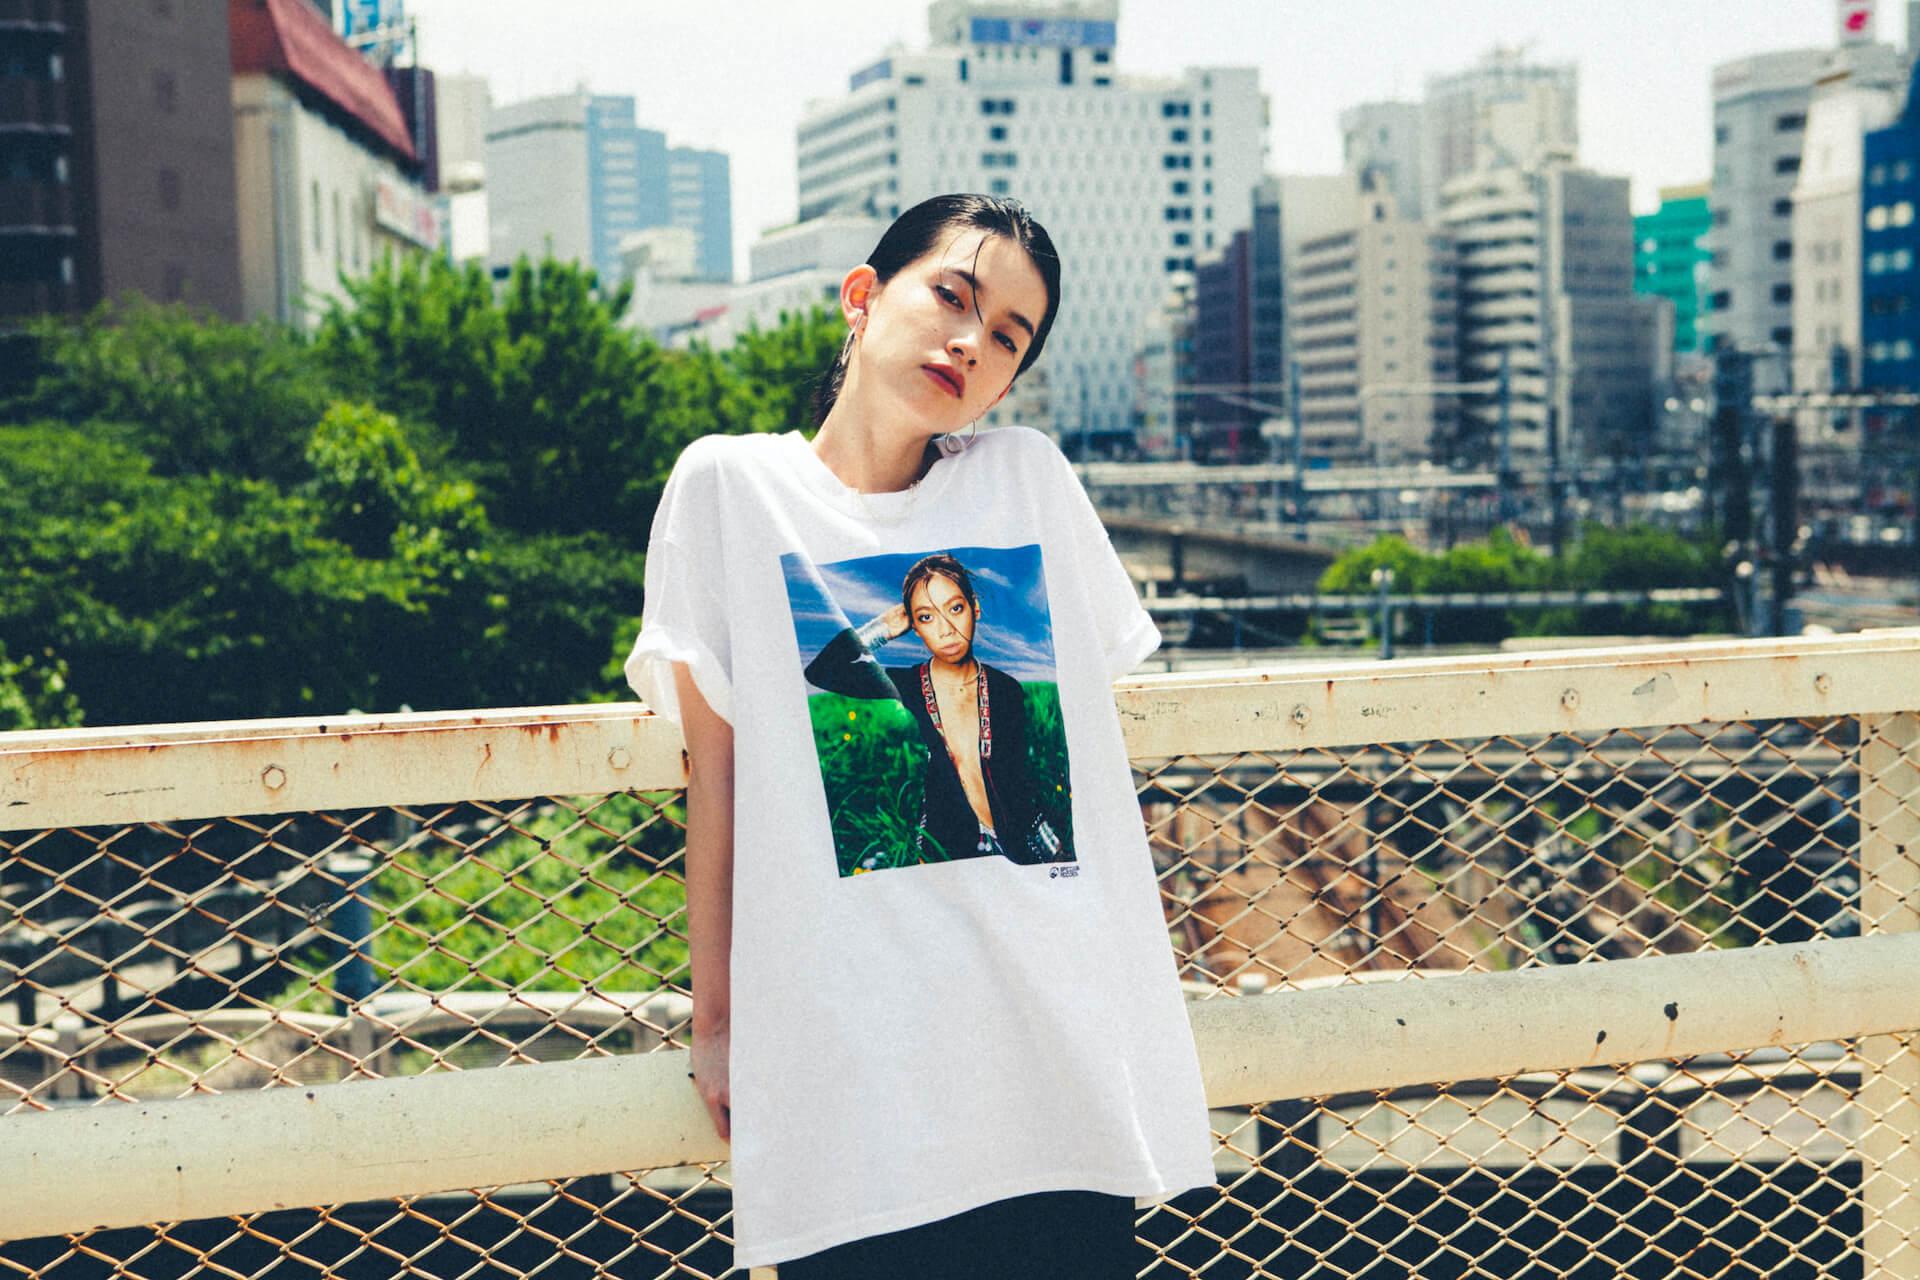 UA × Journal StandardのコラボTシャツが6月25日より店舗販売開始|美衣がモデルを務めるビジュアルも公開に life_fashion210611-ua-journalstandard-2